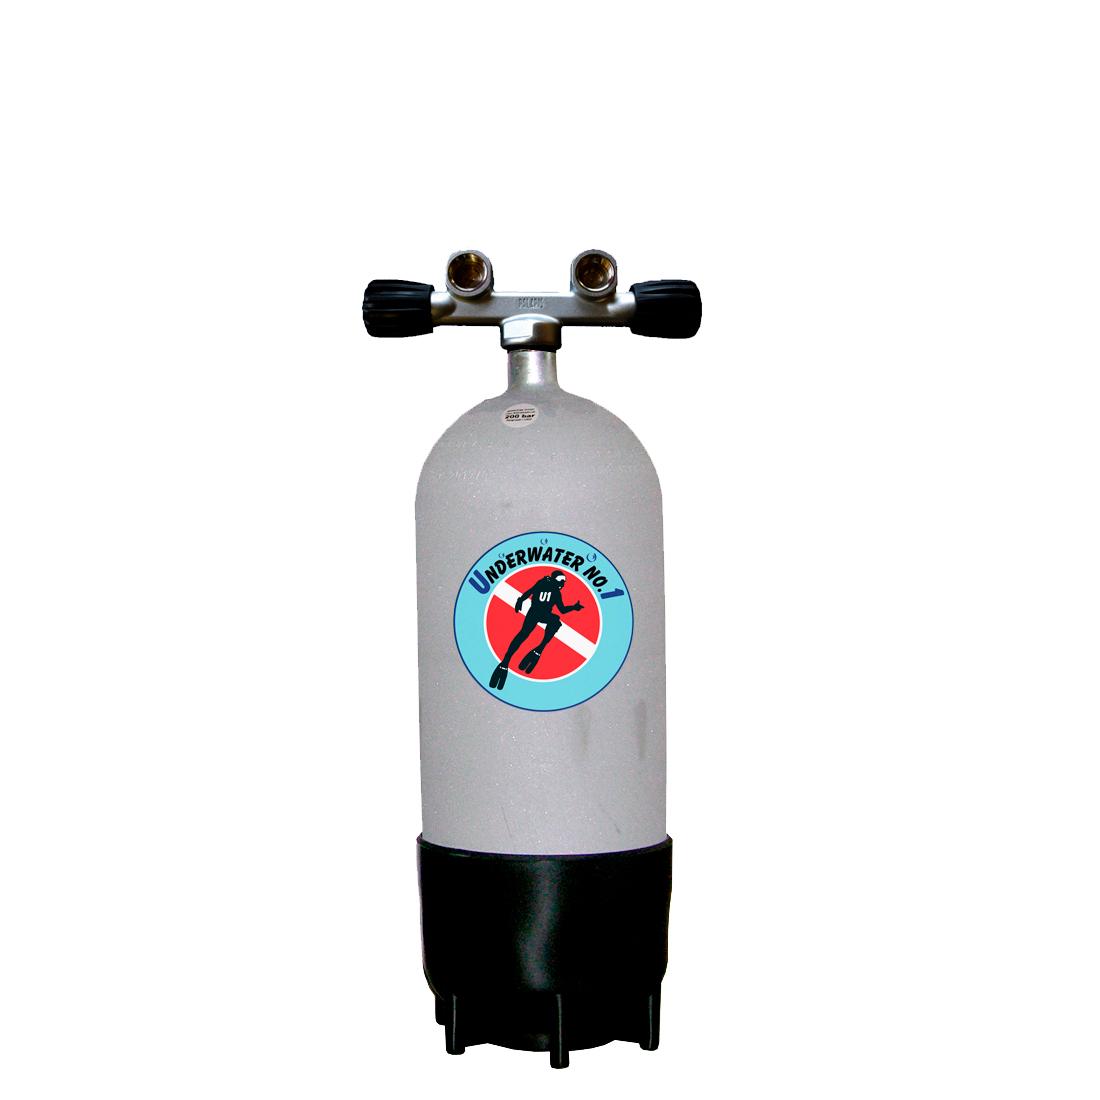 FABER - Tauchgerät 200Bar SteelBeast Twinventil 12944